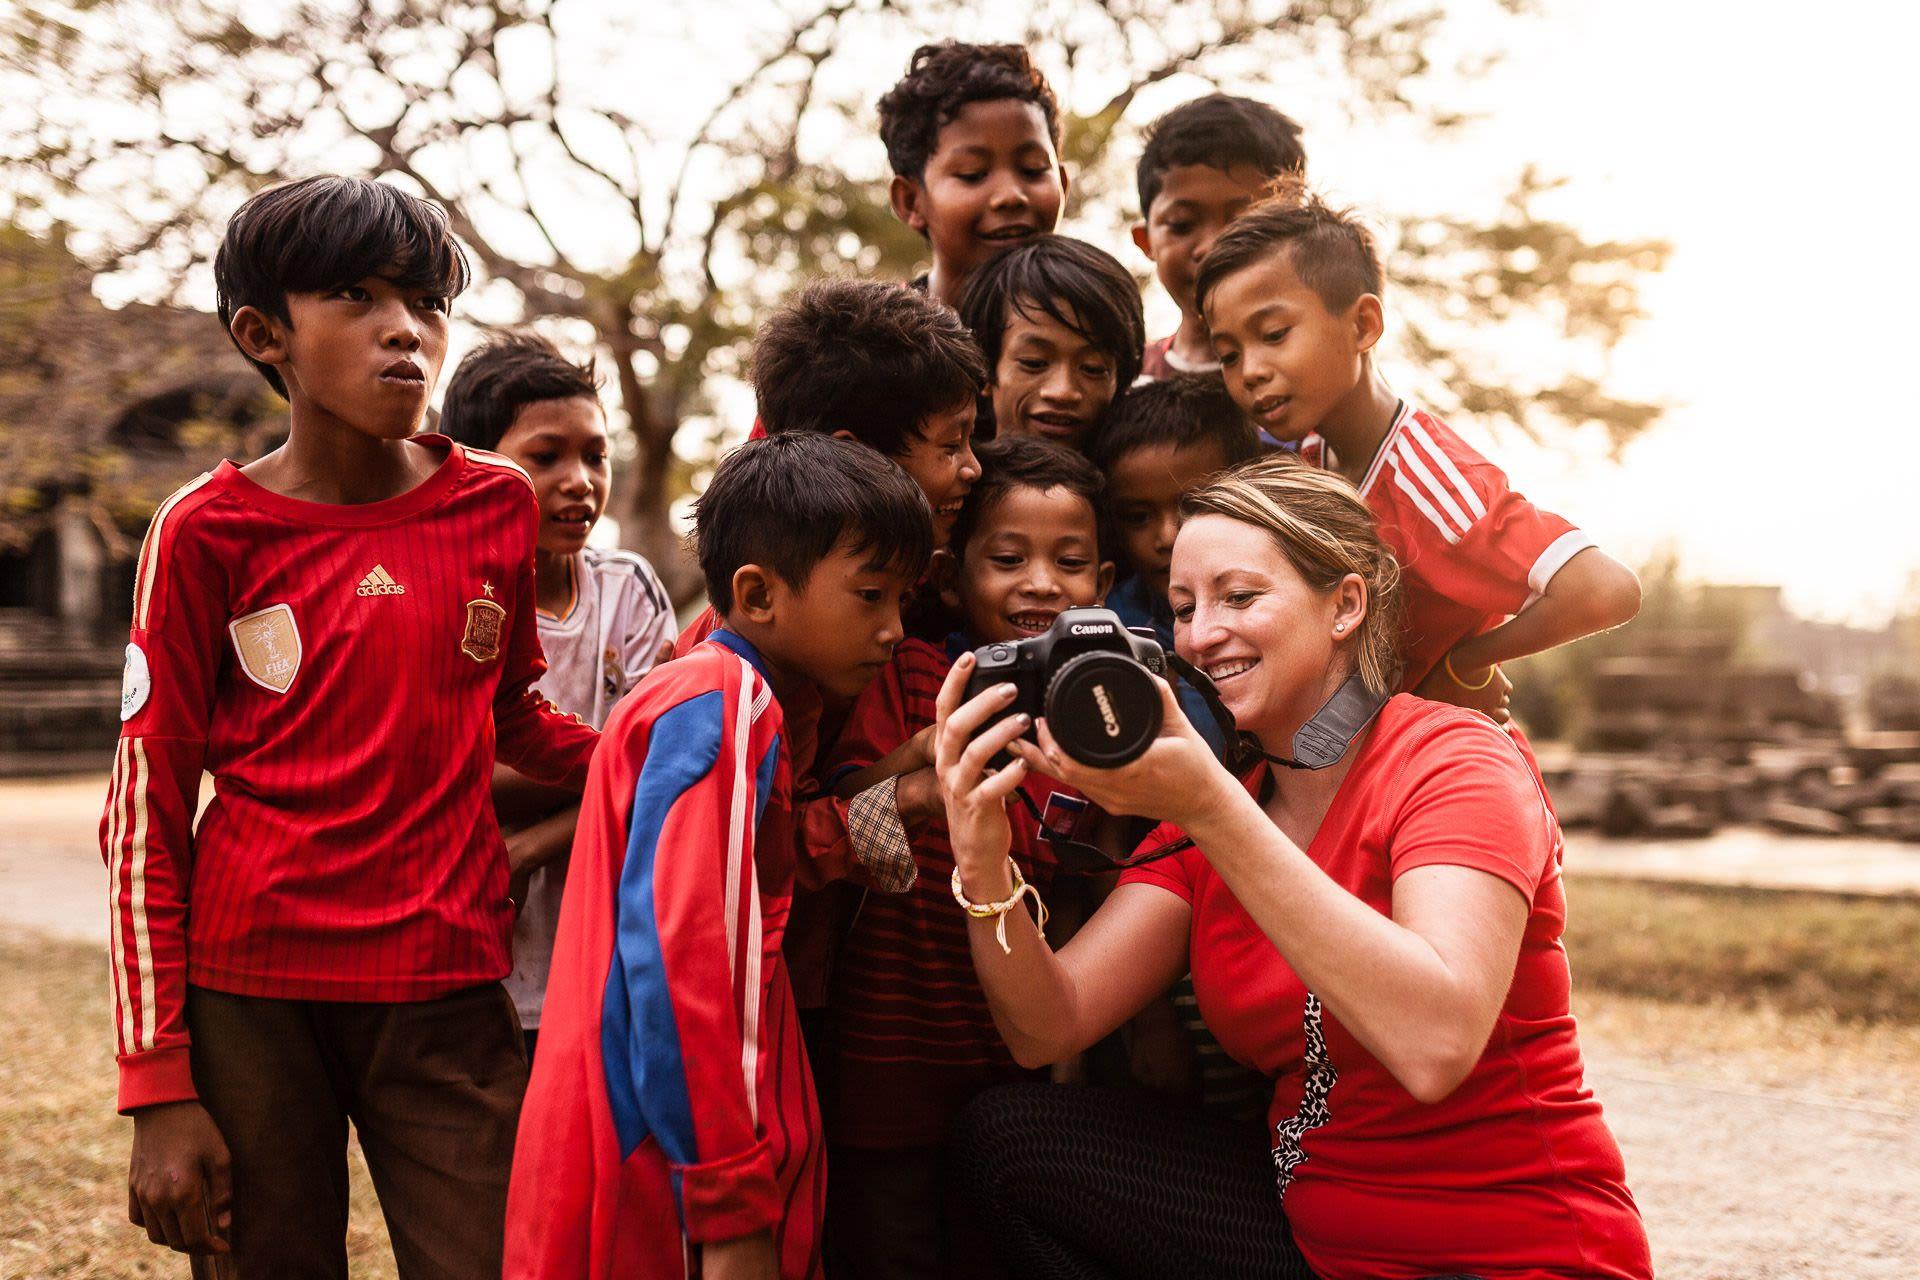 Photo experience on Tonlé Sap Lake